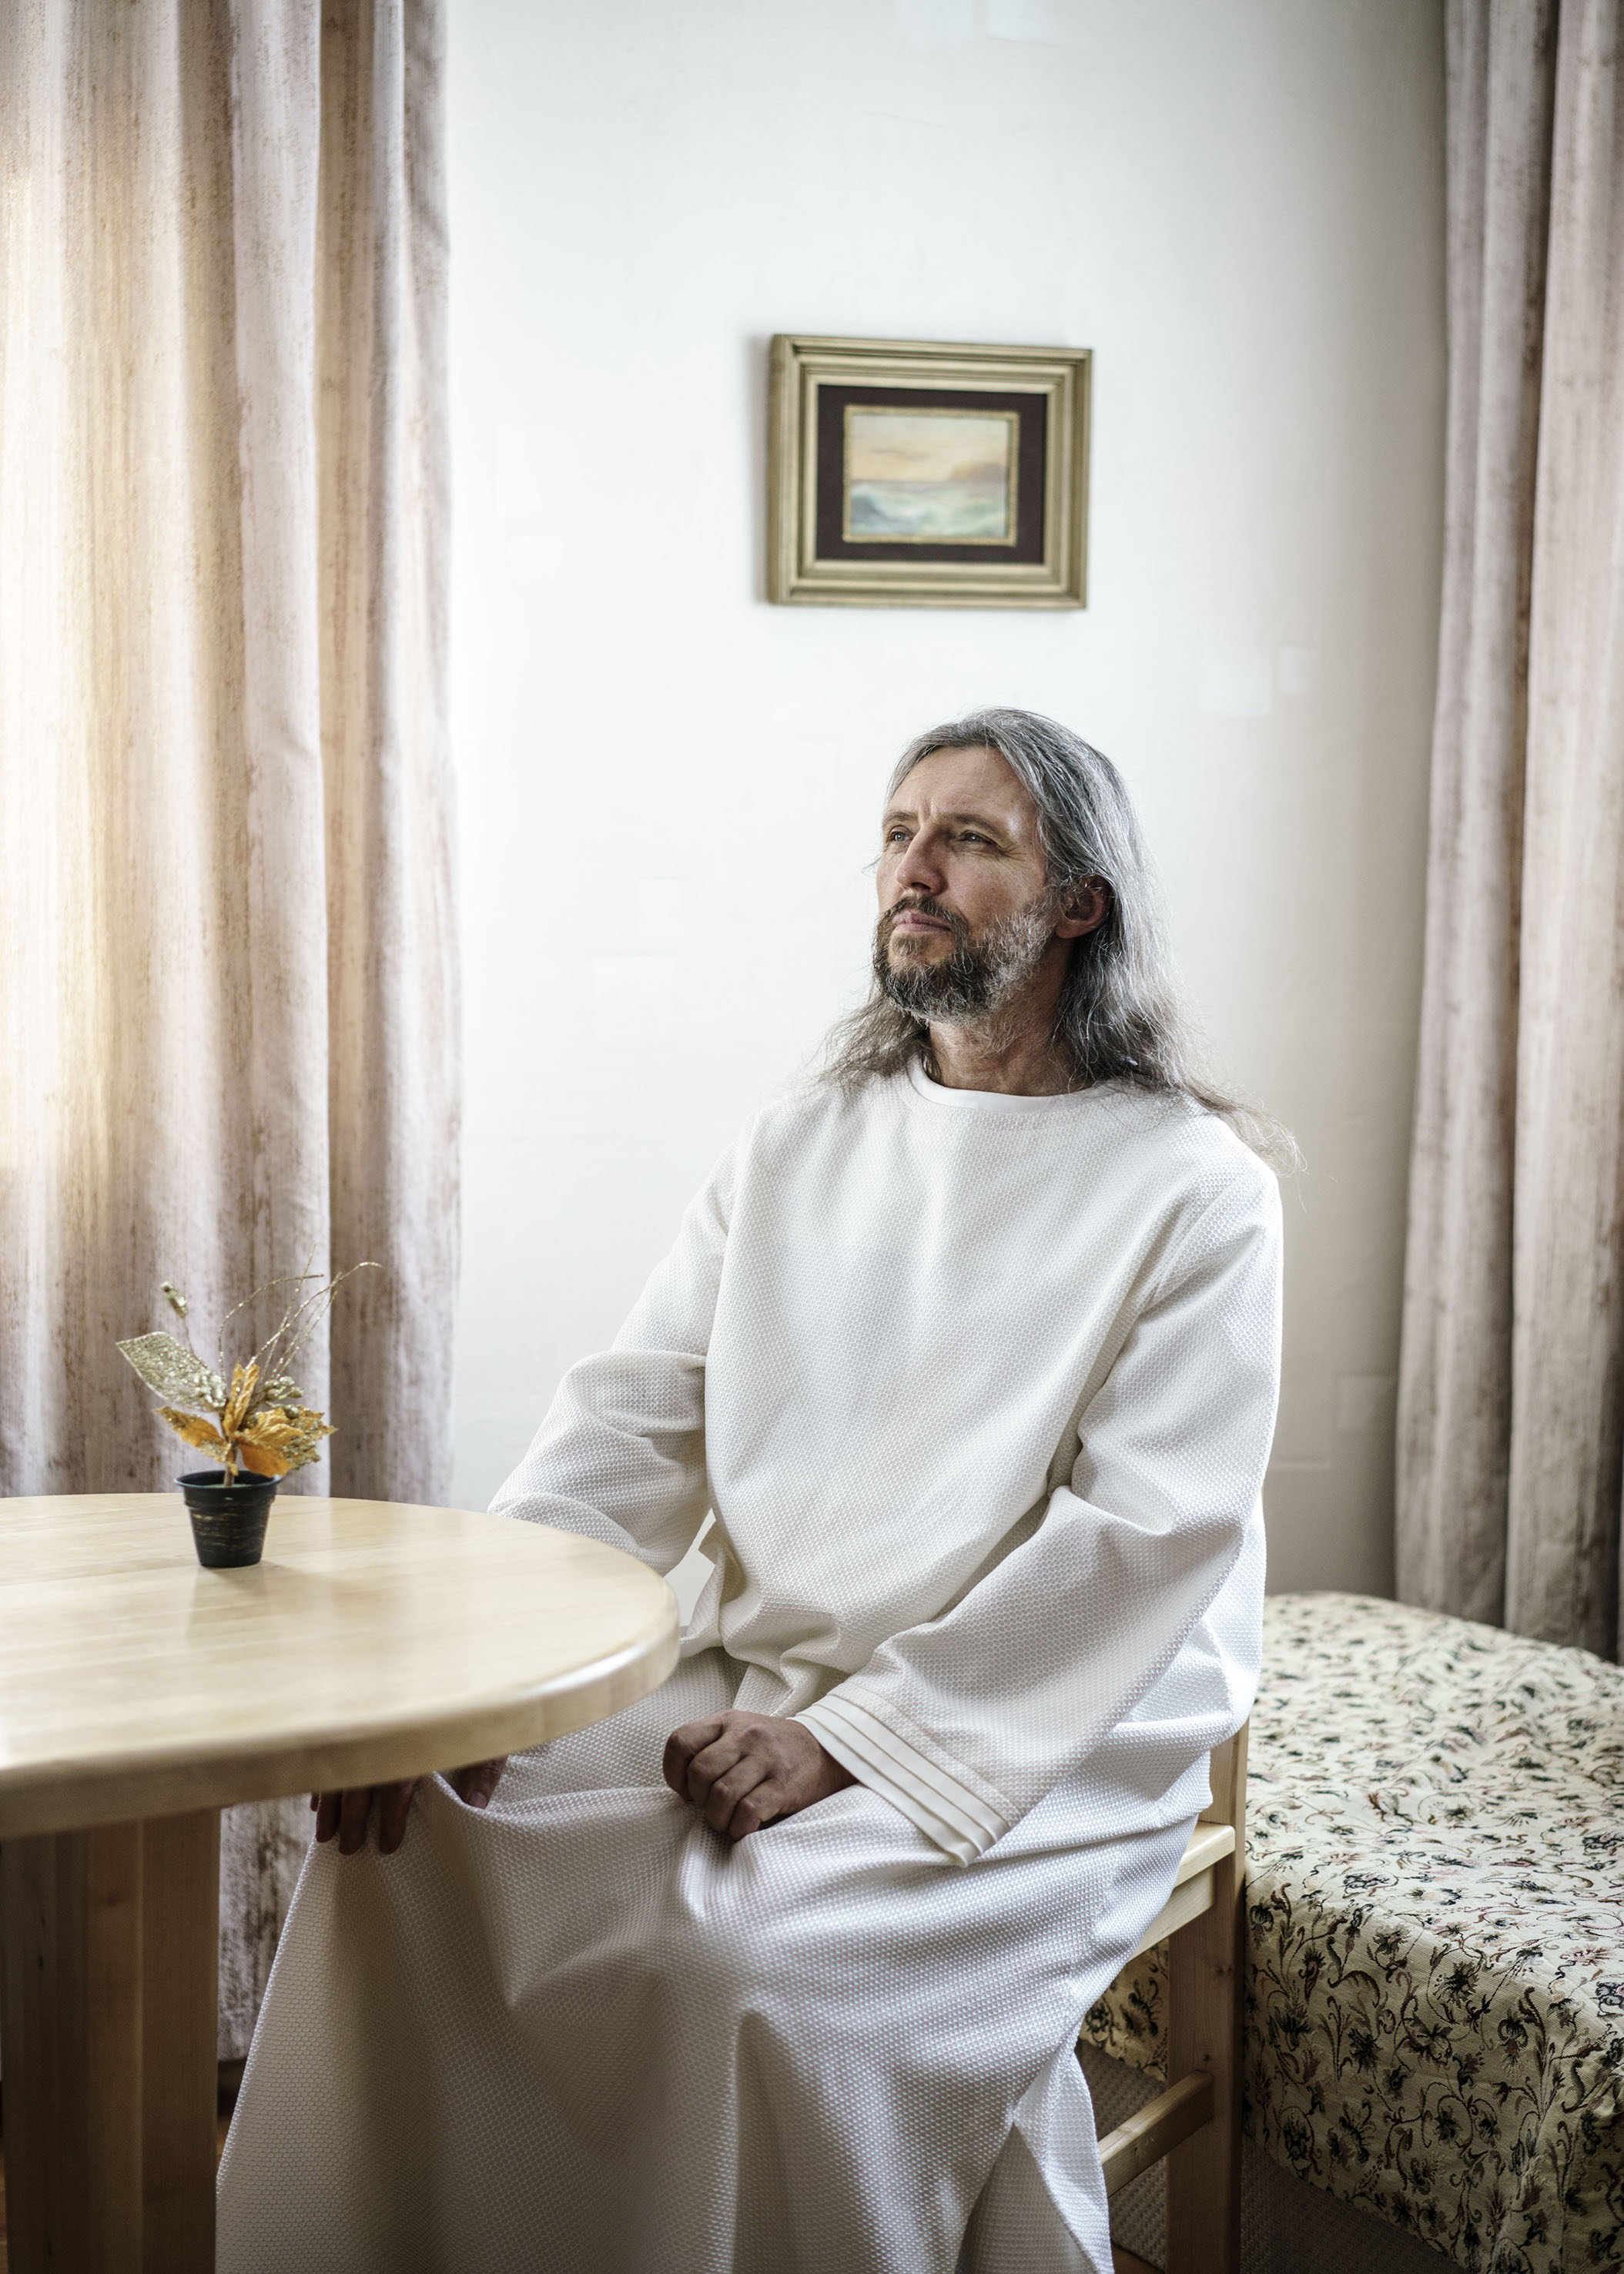 Russia. 2016. Krasnoyarski Krai. Vissarion, the Christ of Siberia.